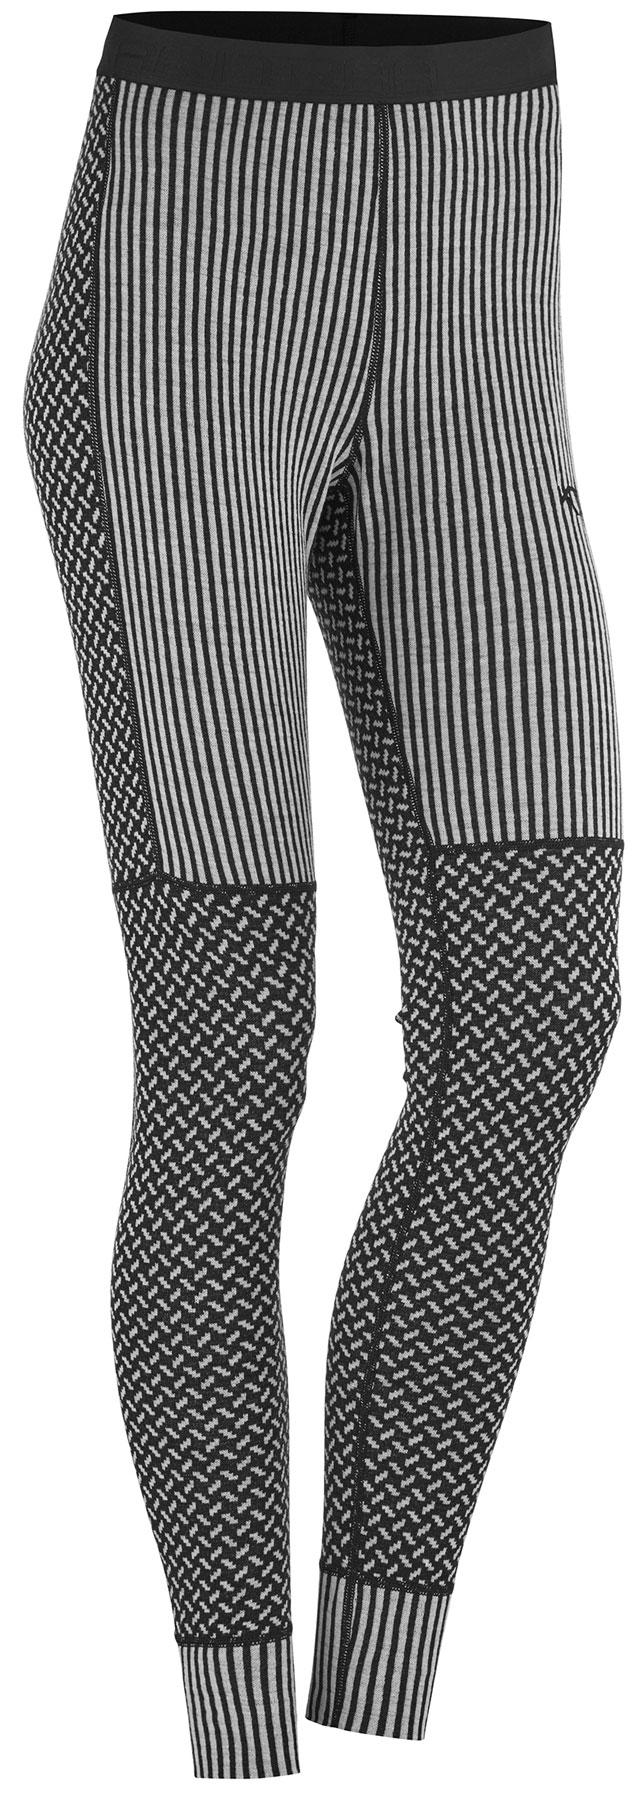 Kari Traa Smekker Women's Baselayer Pant - black